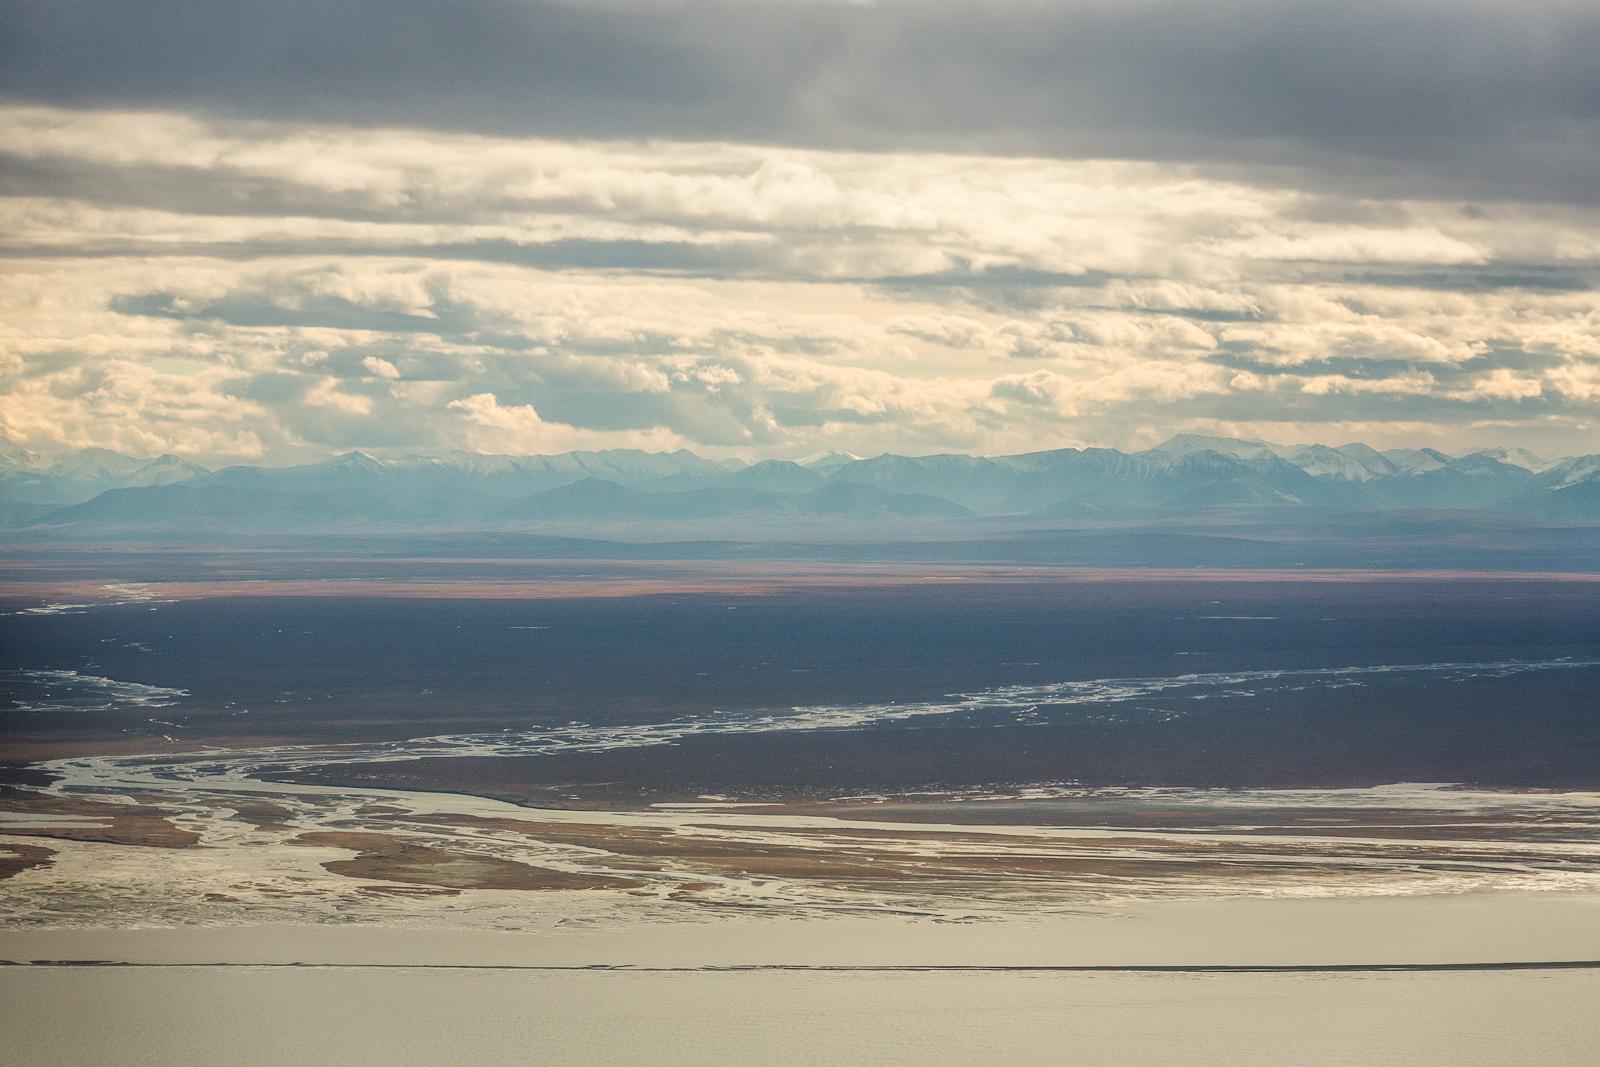 Trump should reverse Obama's ban on Arctic offshore energy development